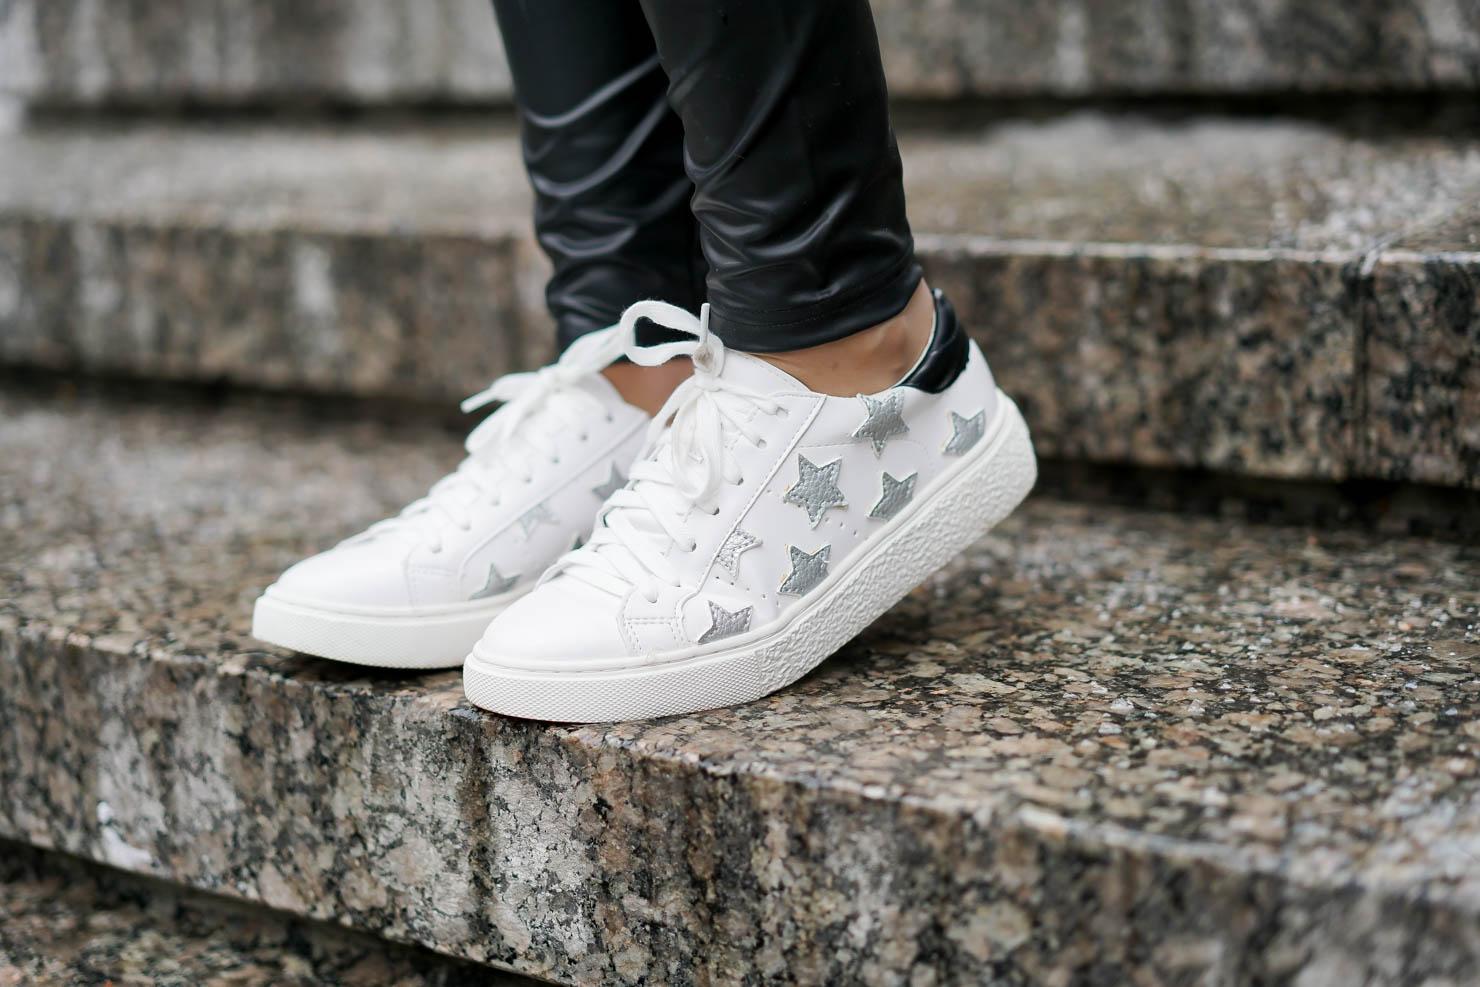 star sneakers, leopard leggings, designer dupe